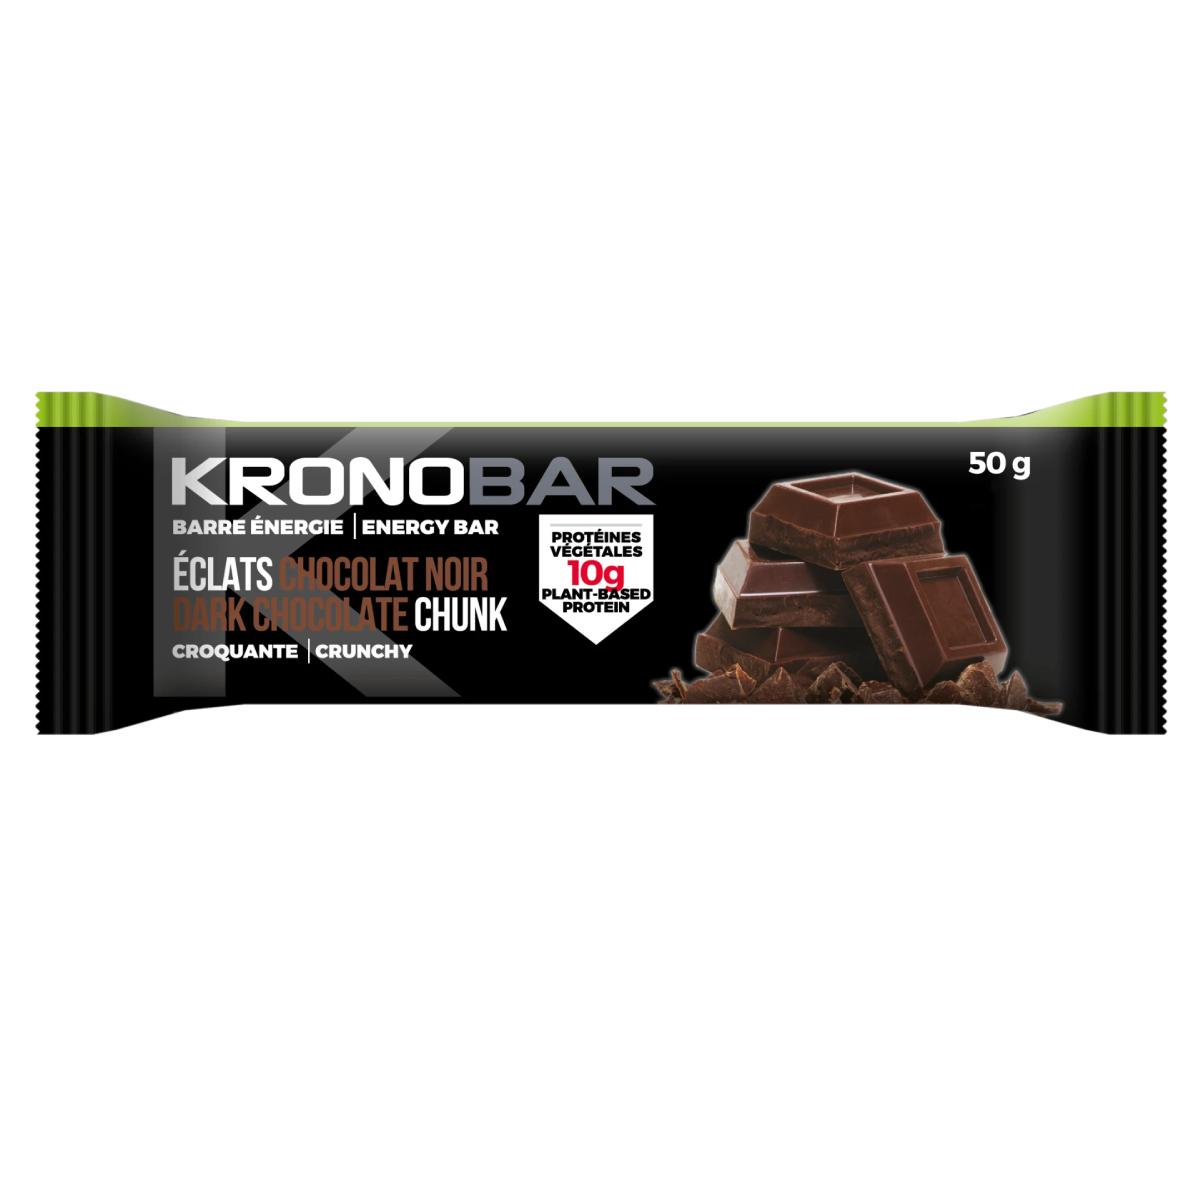 BARRE ENERGETIQUE PROTEINEE KRONOBAR ECLAT CHOCOLAT NOIR